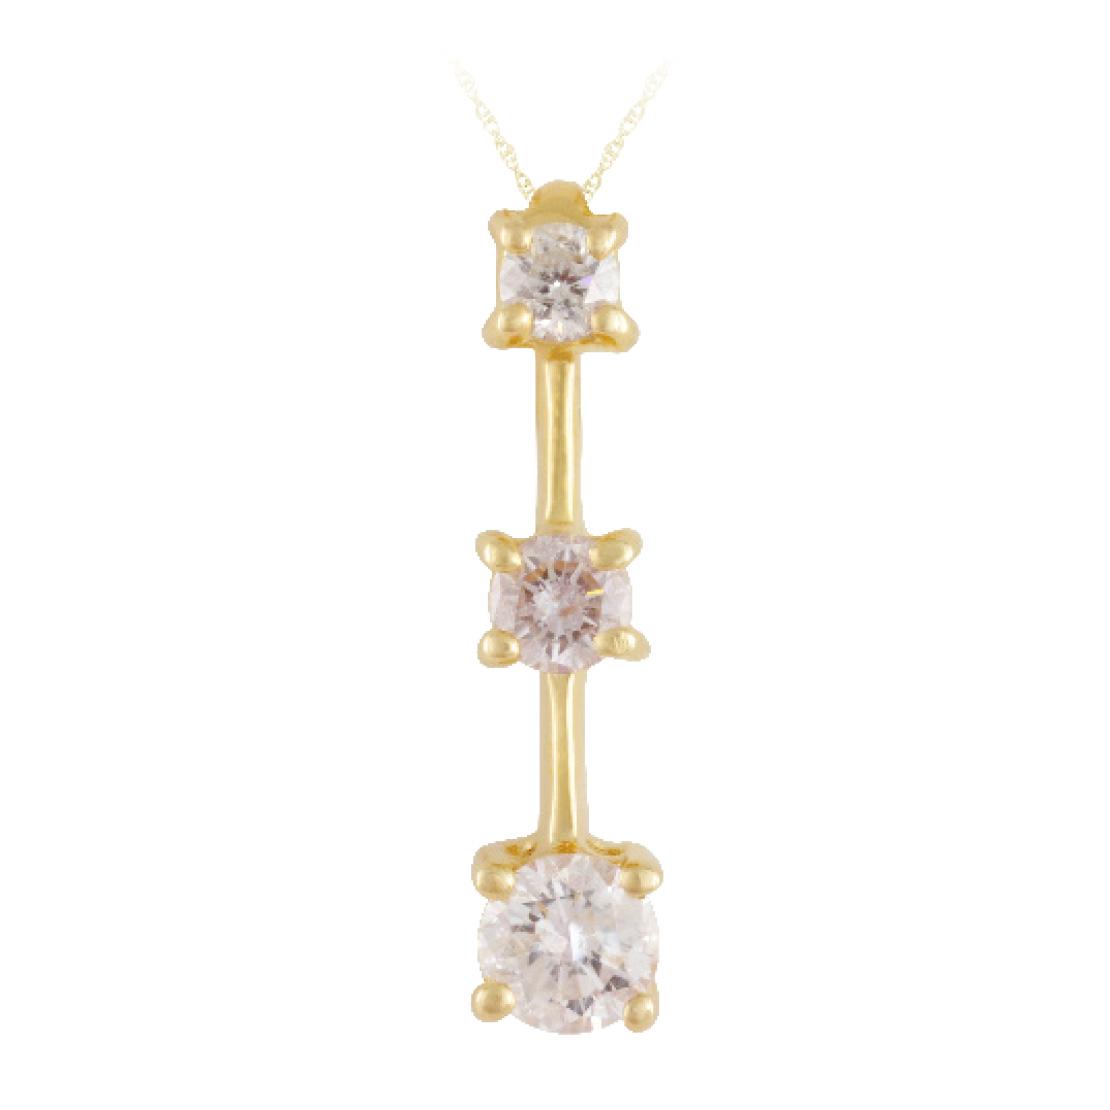 Gold Pendant with 3 Diamonds